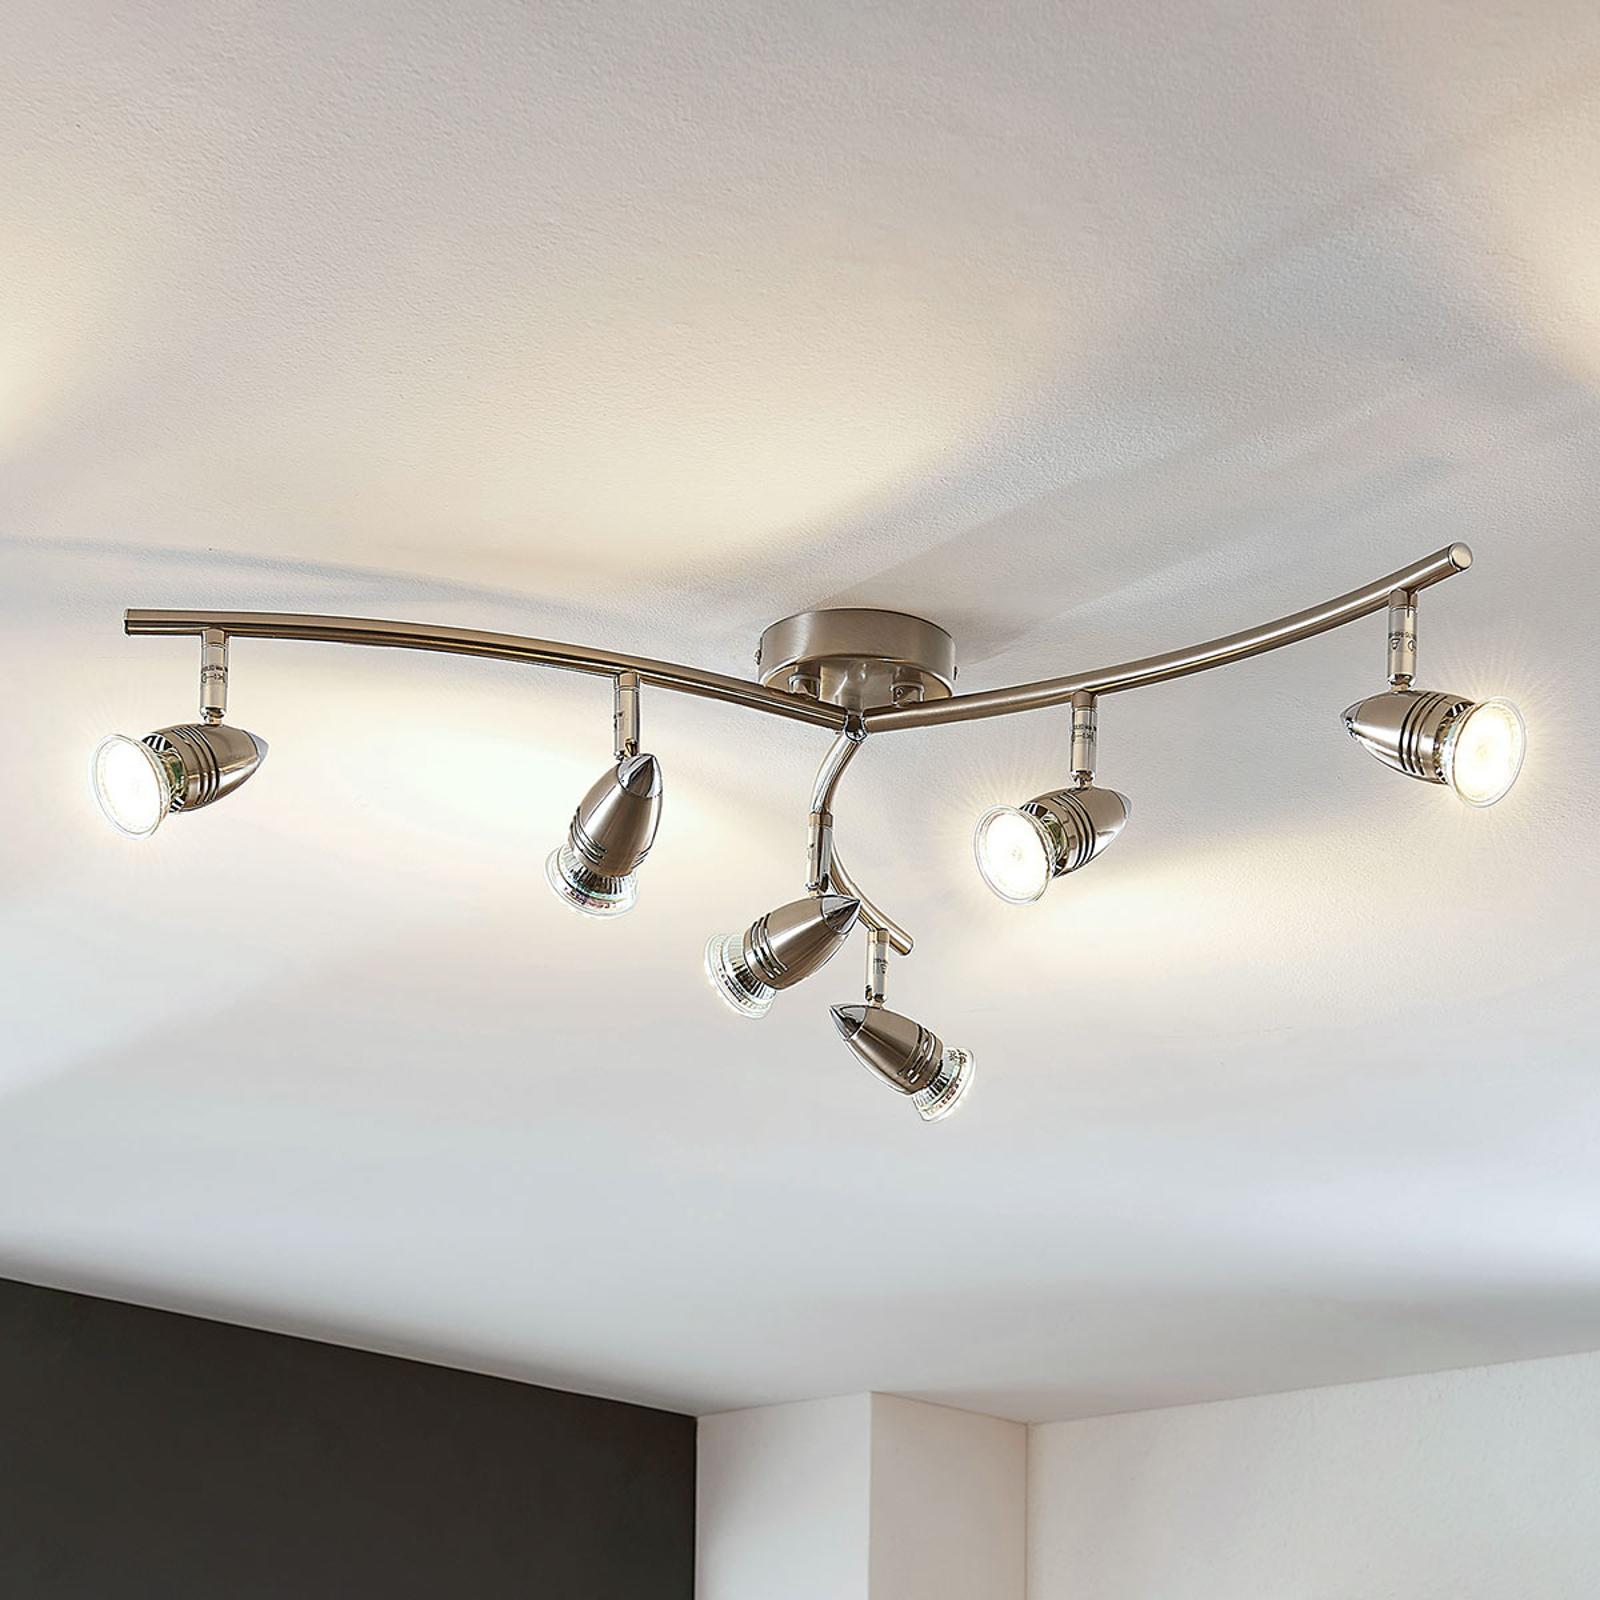 LED-takspot, Benina, 6-lyskilder